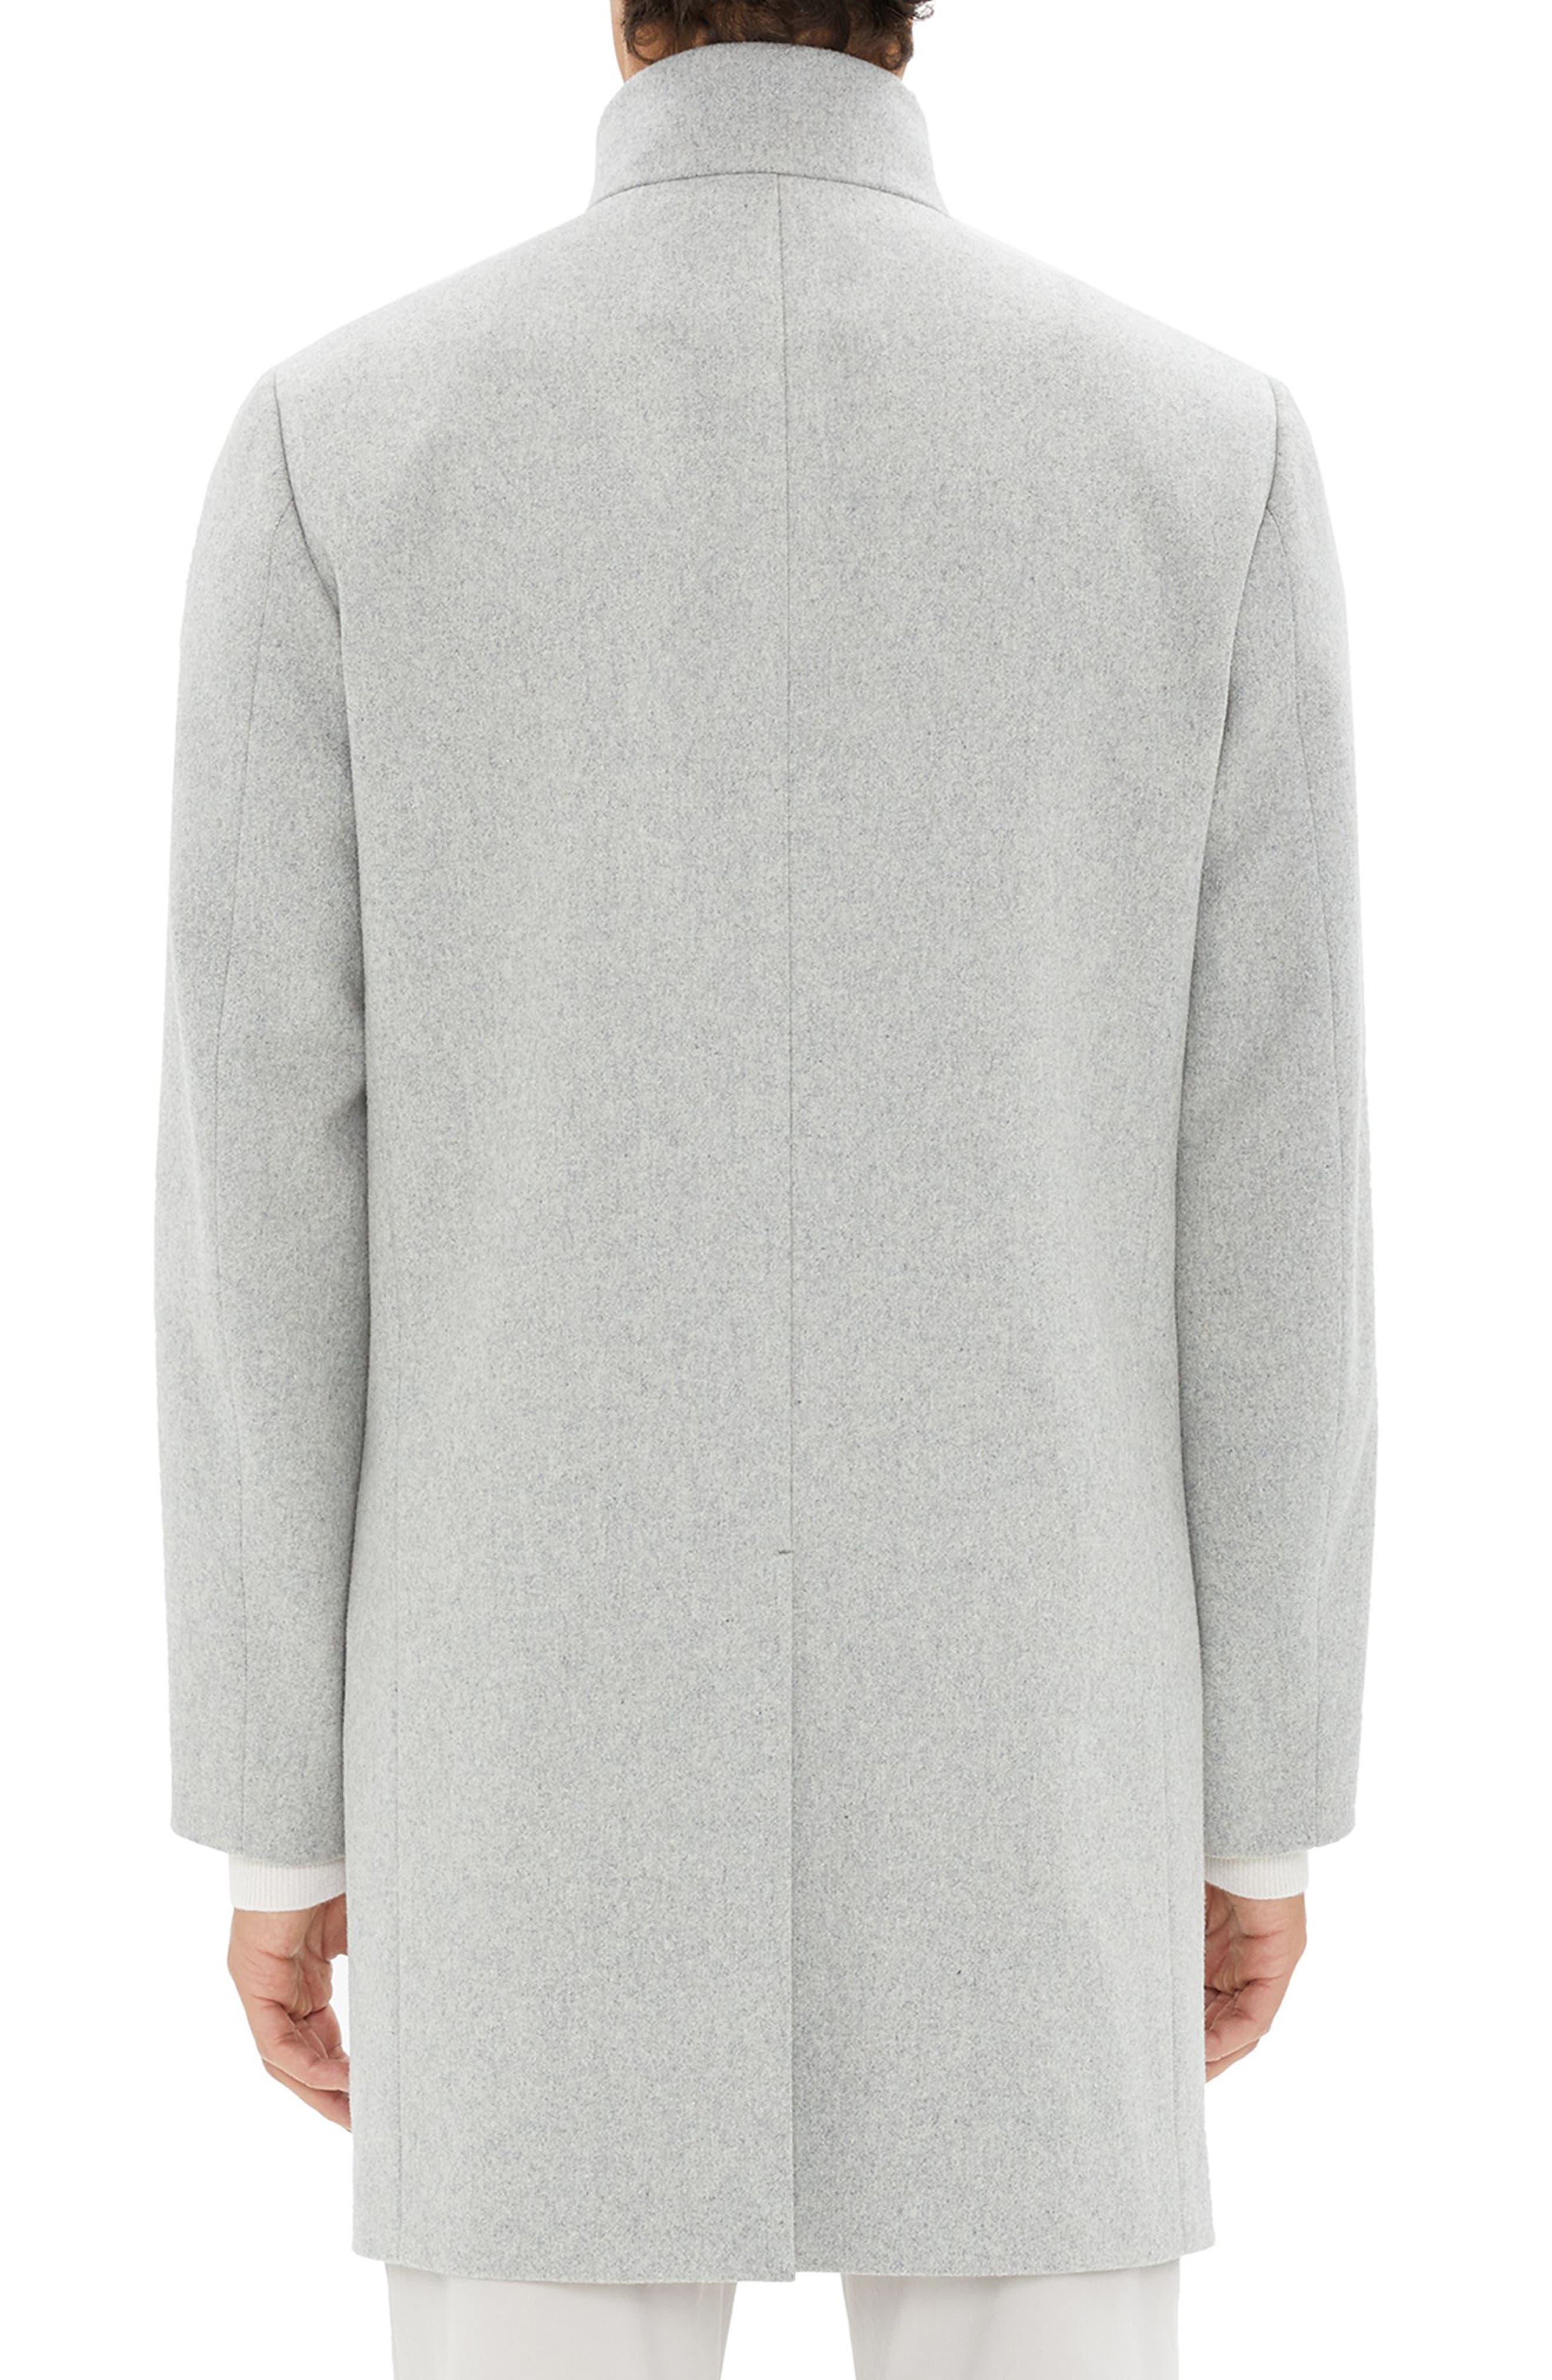 Belvin Modus Melton Wool Blend Coat,                             Alternate thumbnail 2, color,                             GREY MELANGE